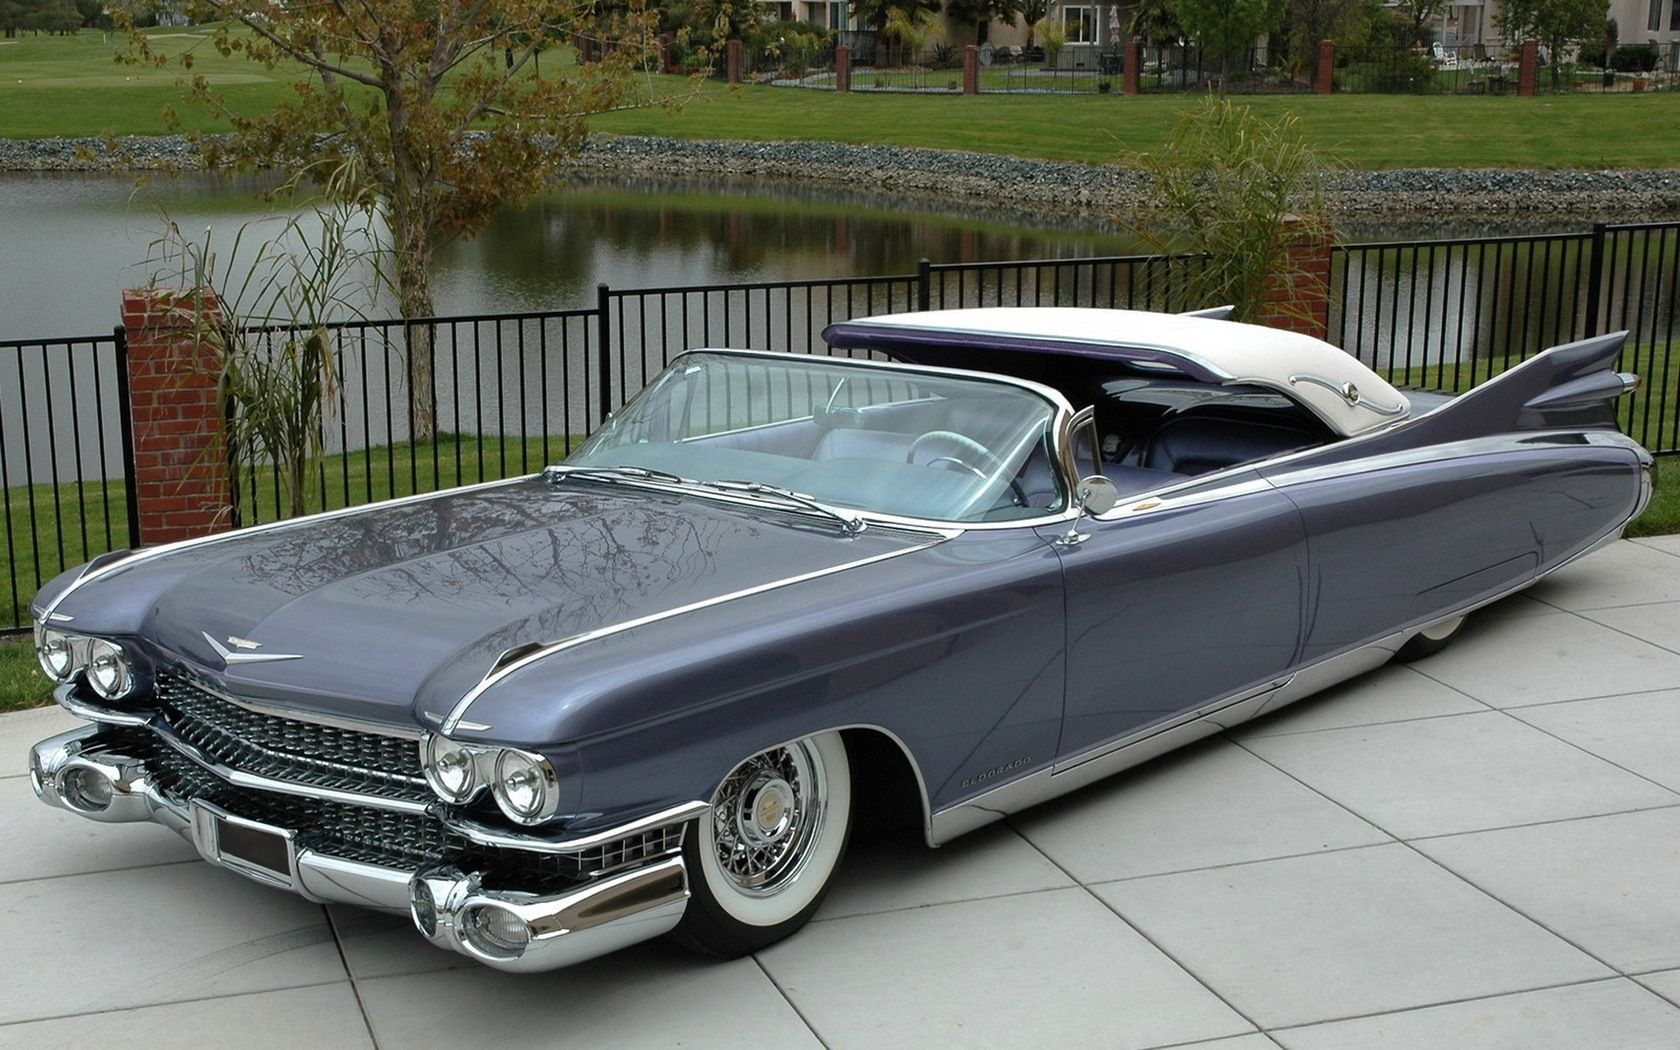 capote cabriolet voiture americaine cabriolets et r alisations de capotes pinterest. Black Bedroom Furniture Sets. Home Design Ideas